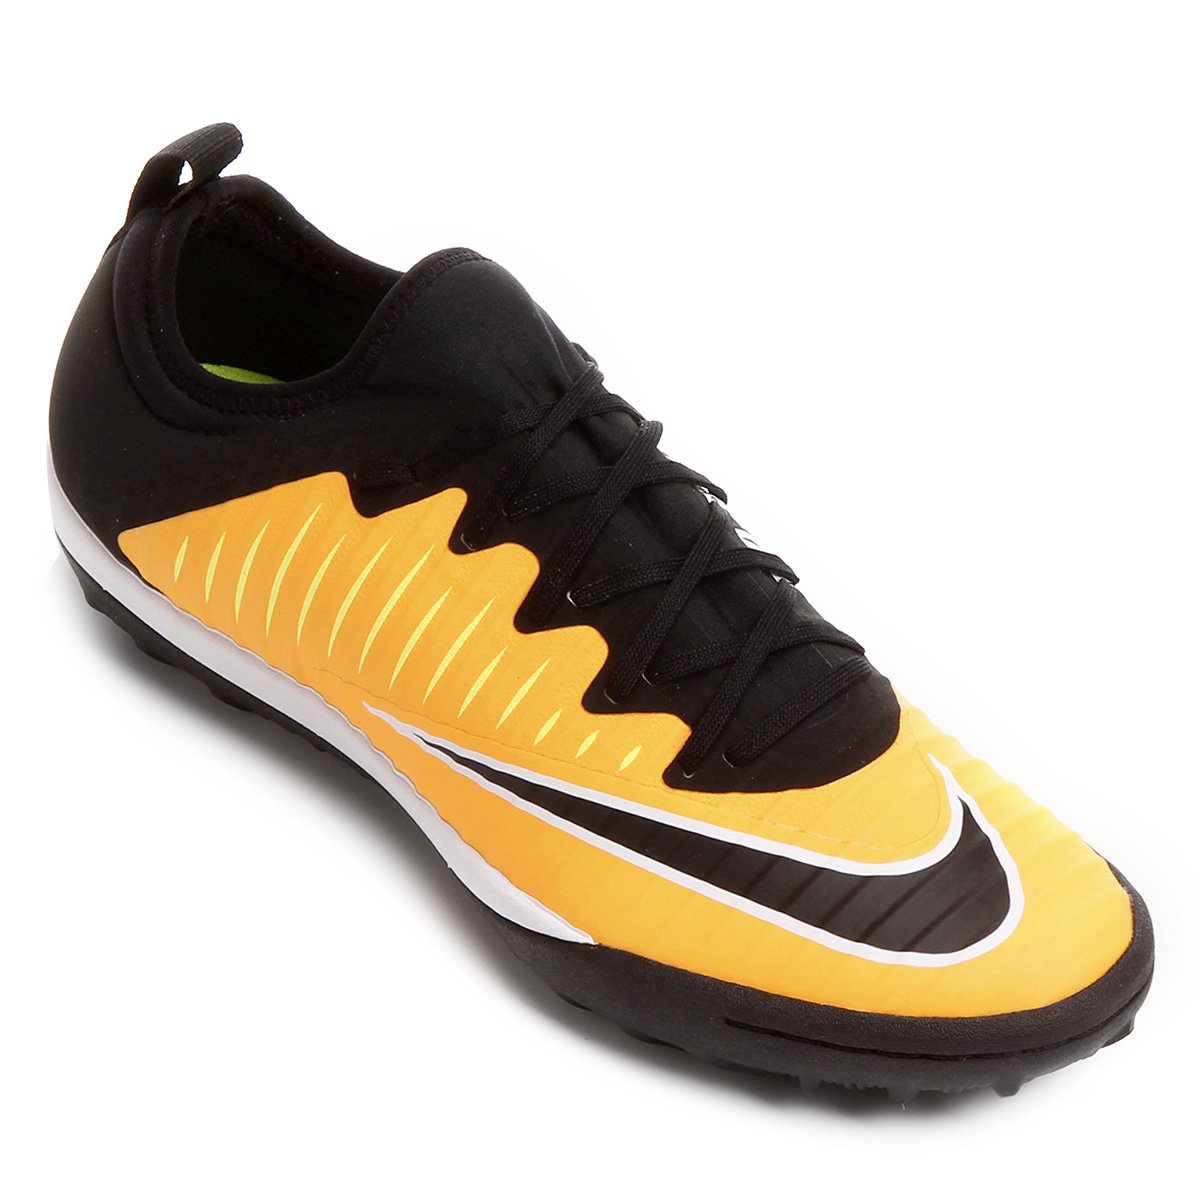 a27df0dbd8 Chuteira Society Nike Mercurial Finale 2 TF - Laranja e Preto ...